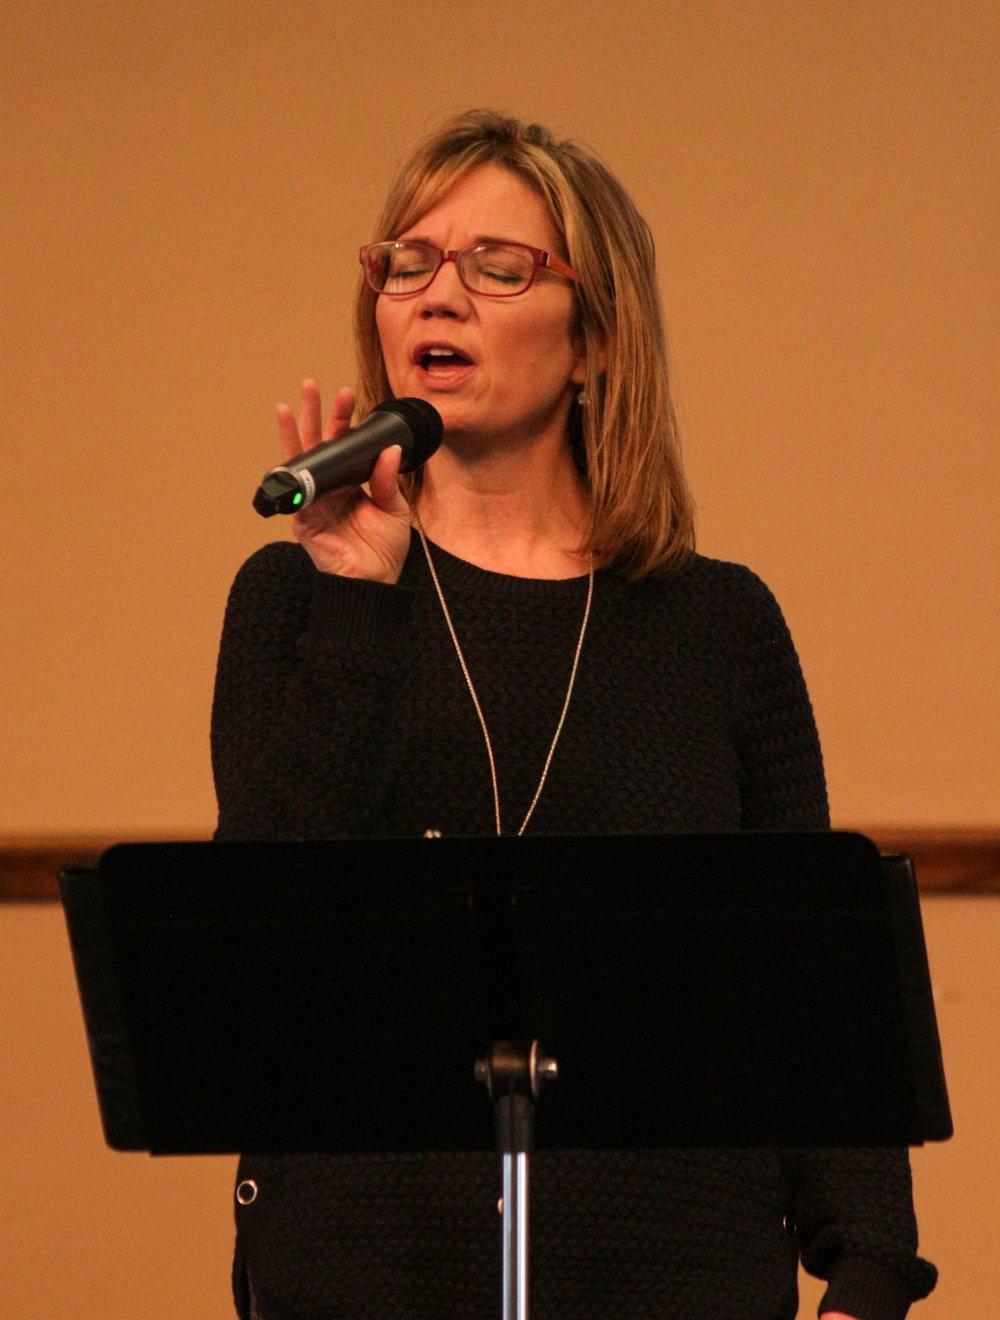 Brenda Roman sings at Dutilh's 9:30 a.m. service.   Photo courtesy of Sam Hogue.